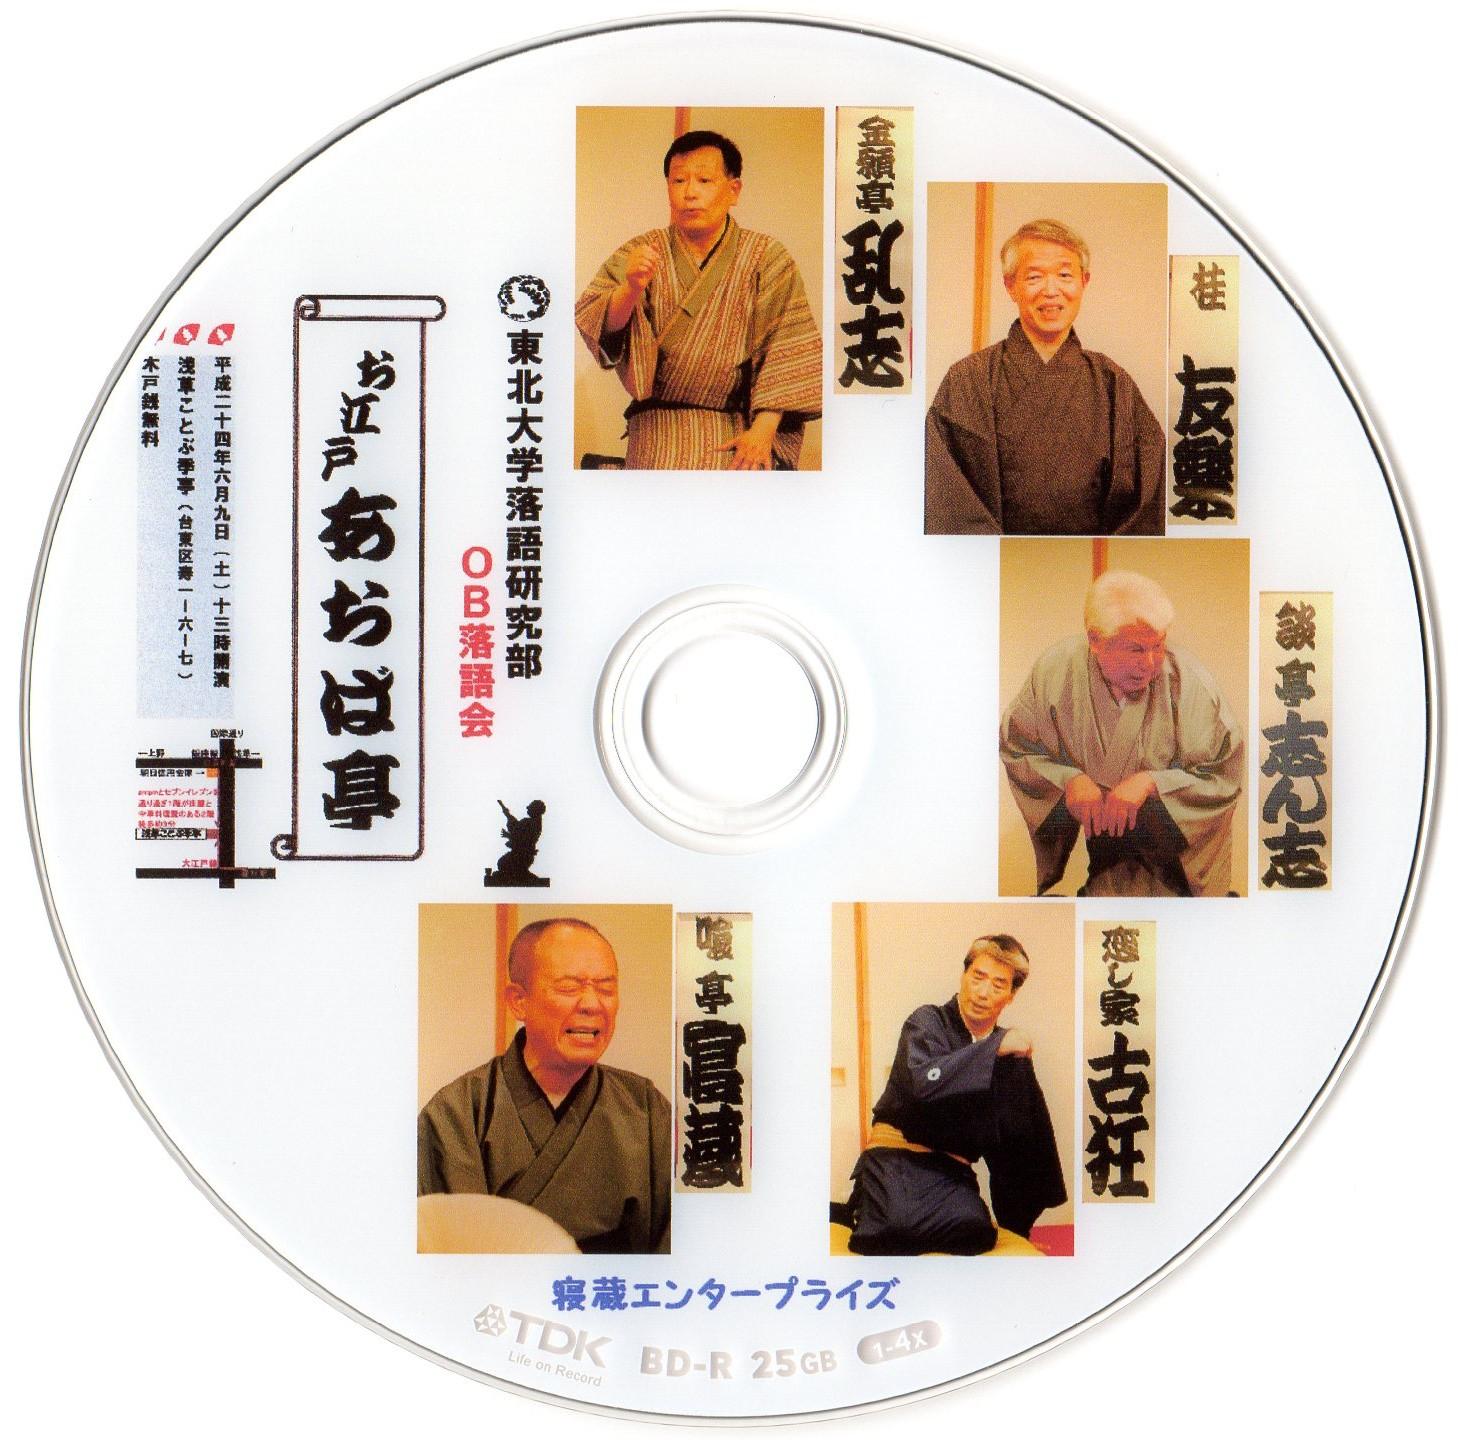 Fw:dvd